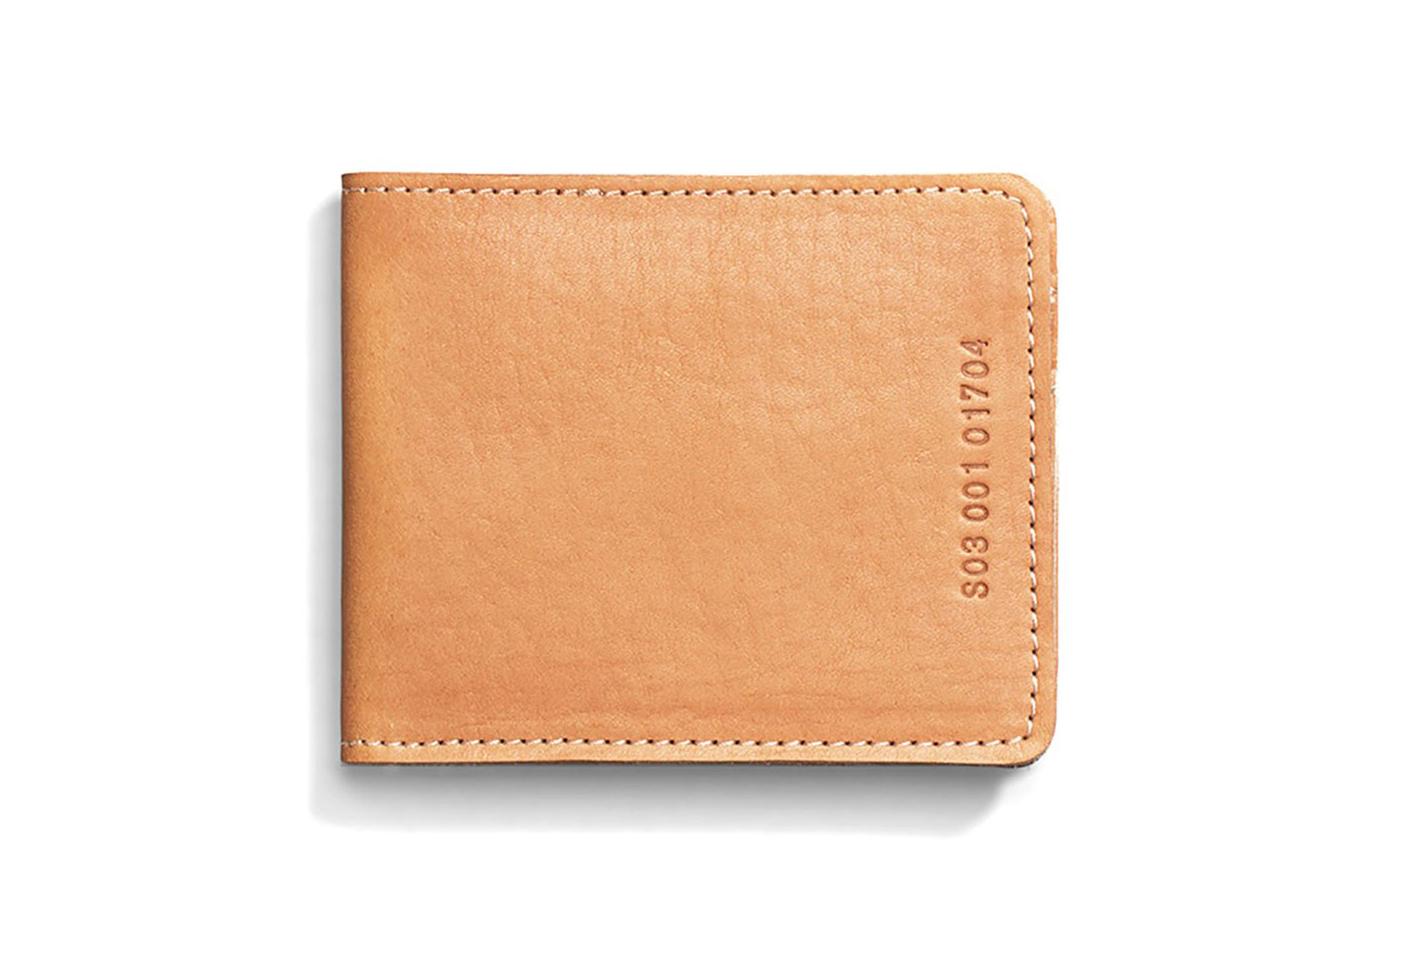 shinola-bifold-wallet-1